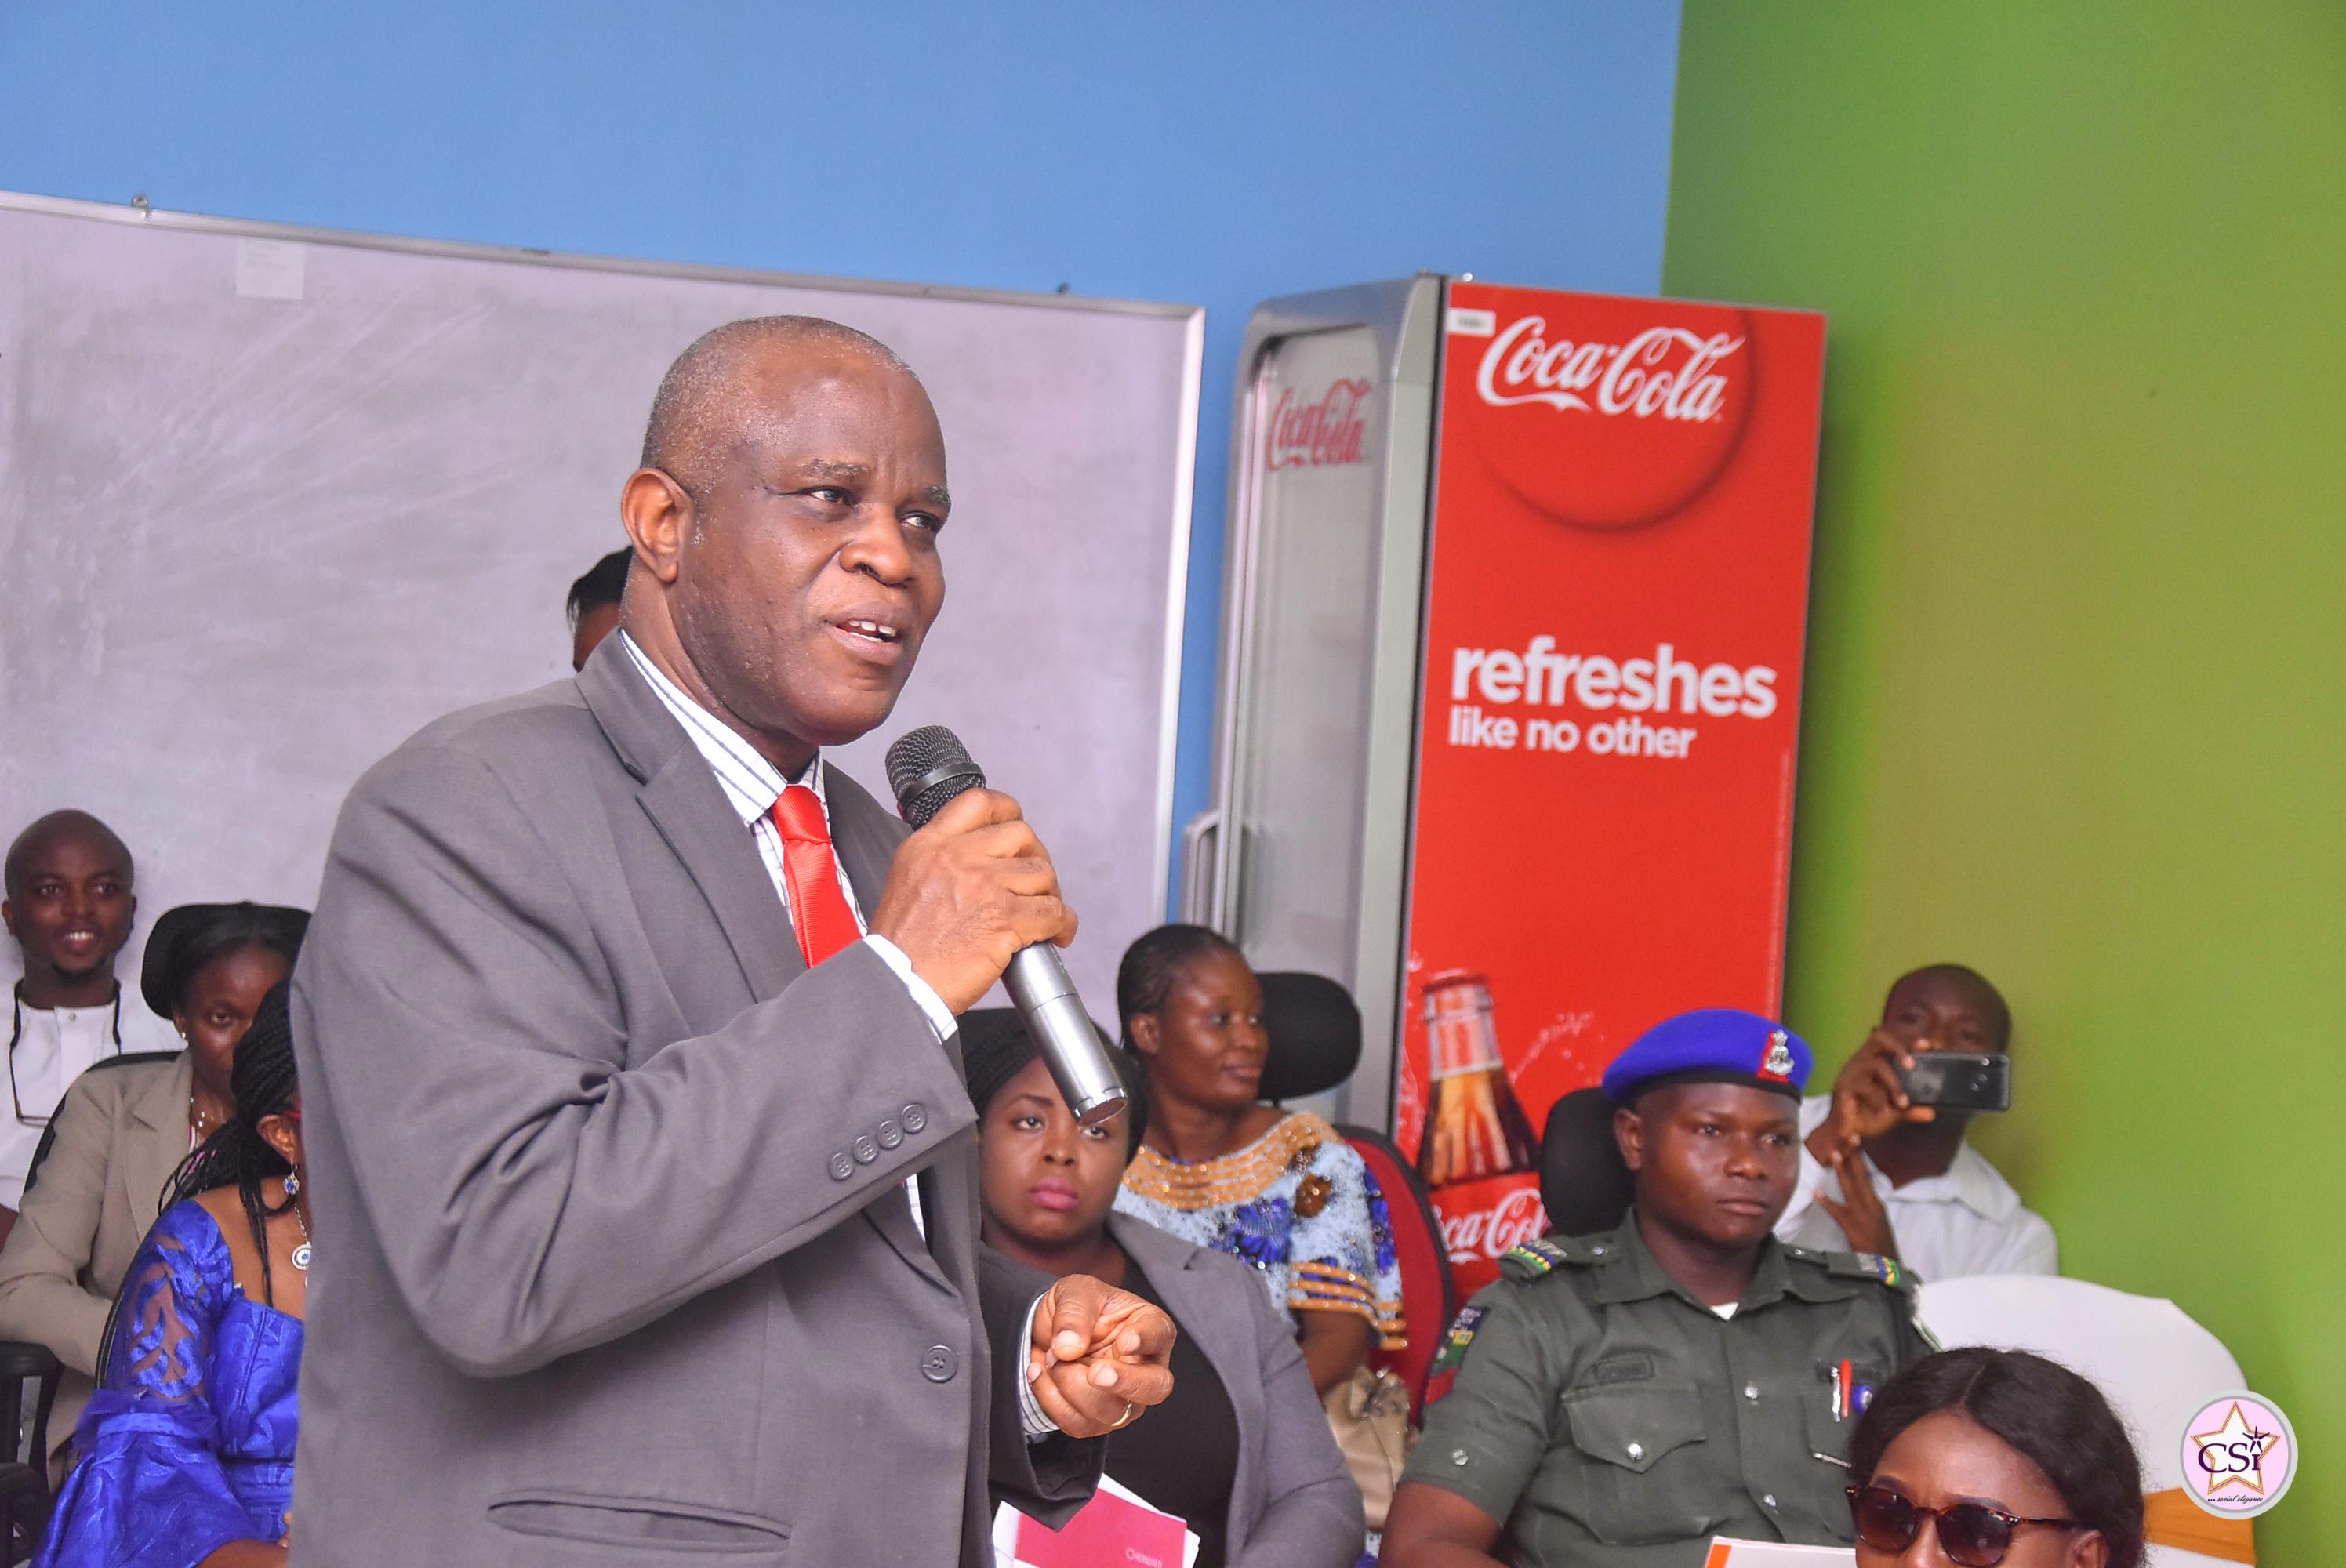 Vice Chancellor of the Federal University of Technology, Akure (FUTA) Professor J.A Fuwape